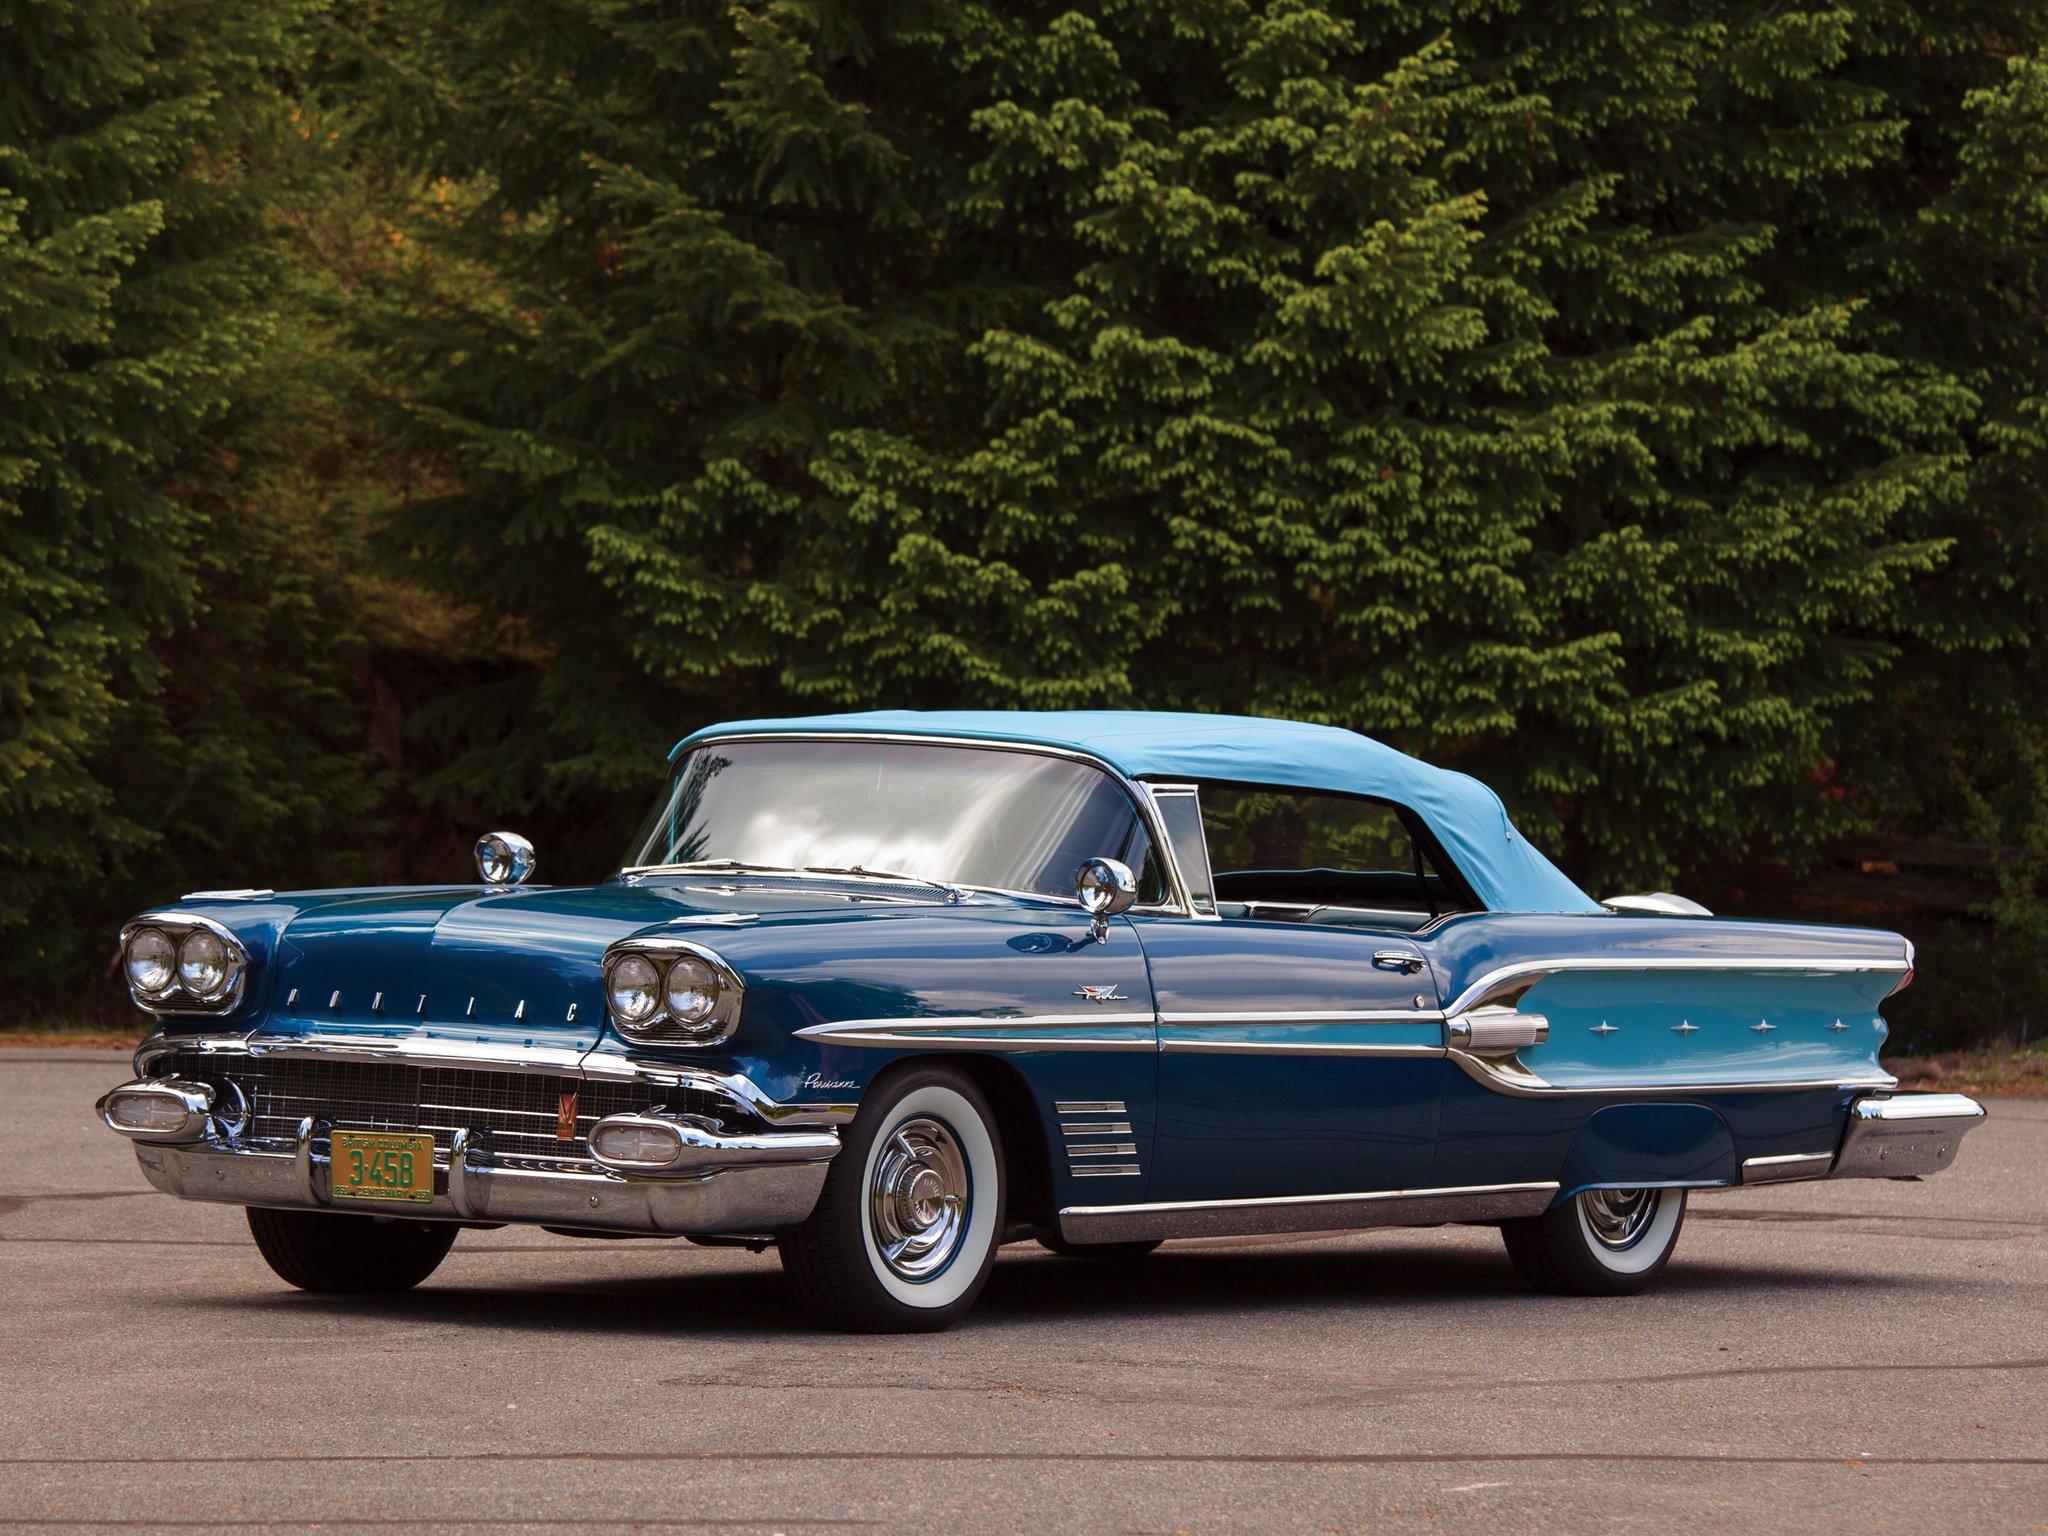 1958 Pontiac Wiring Diagram Library Classic Car Headlight Parisienne Convertible Luxury Retro T Wallpaper 2048x1536 244961 Wallpaperup